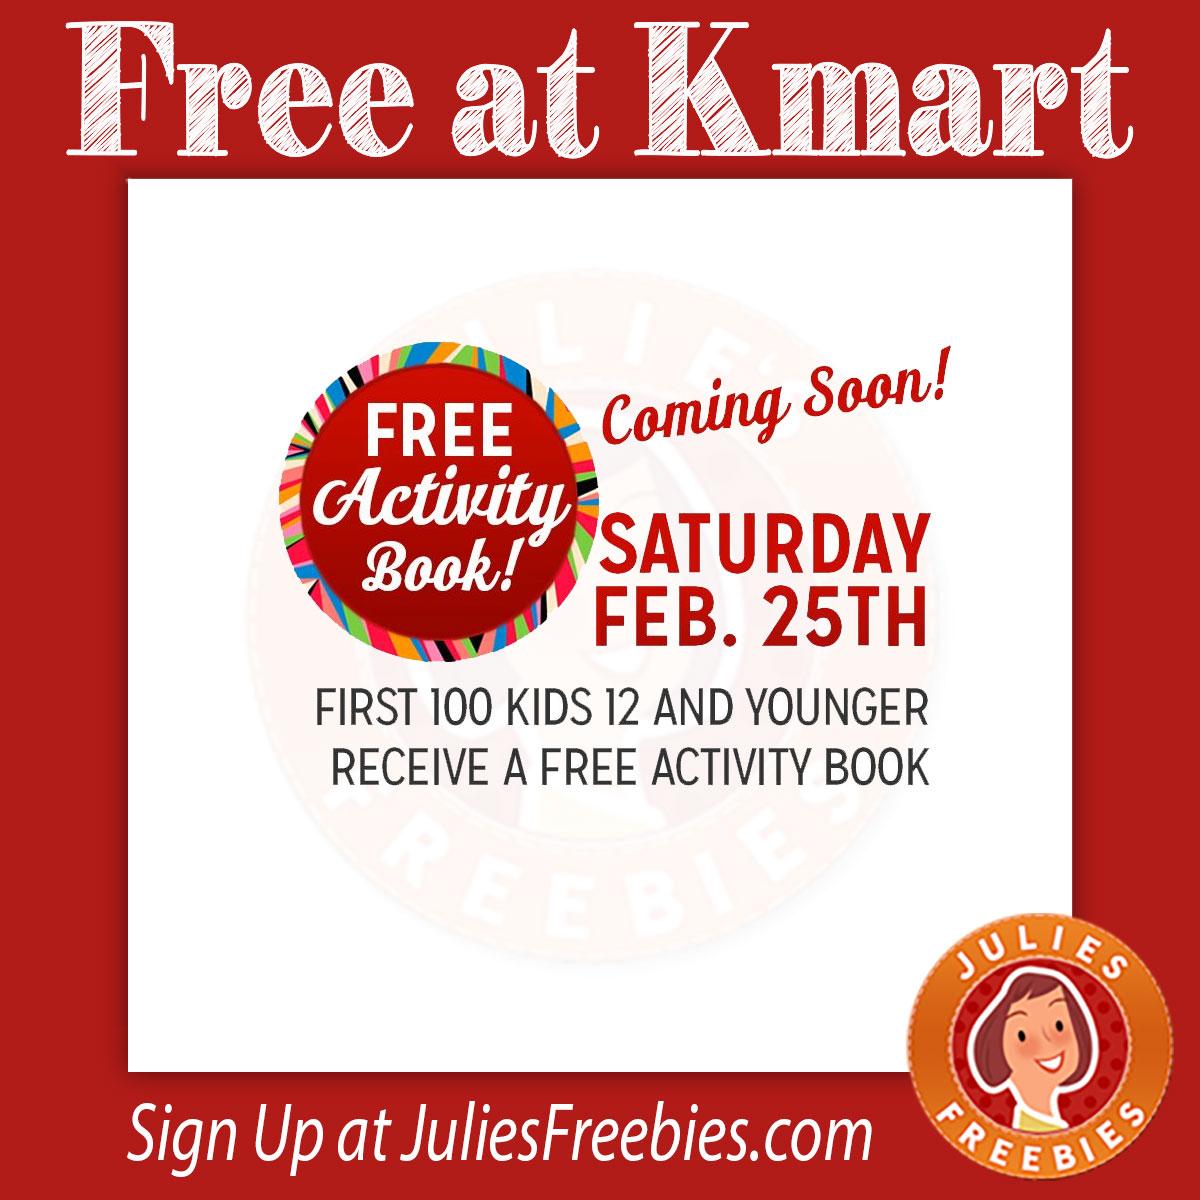 Free Activity Book At Kmart